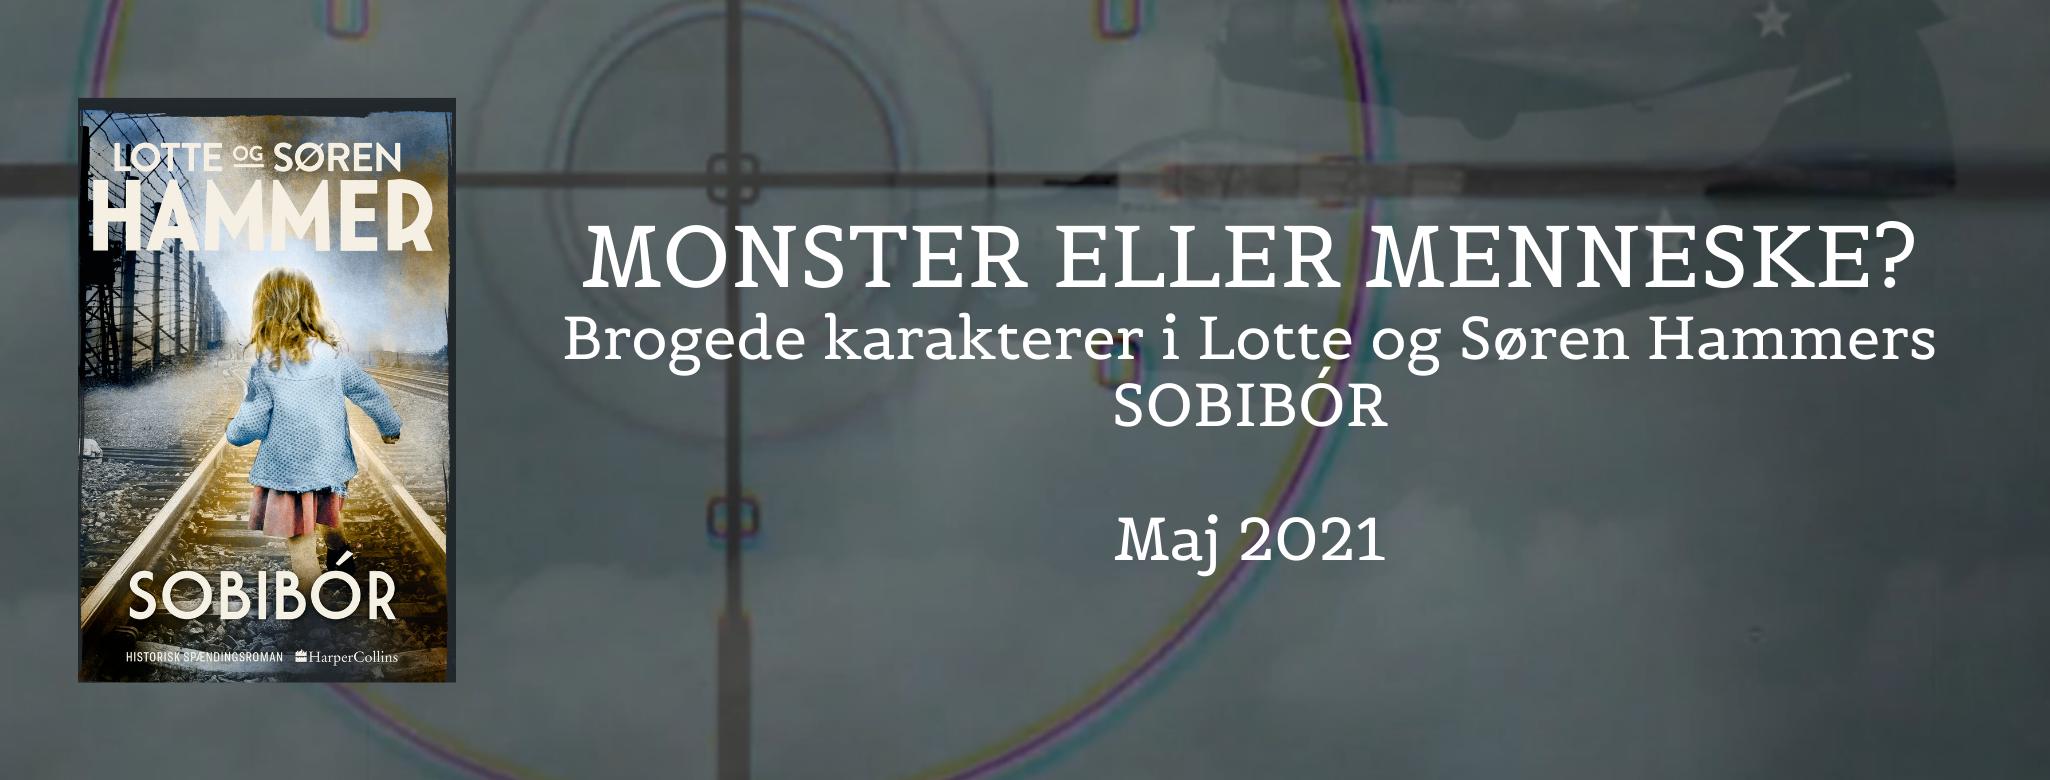 Sobibór banner